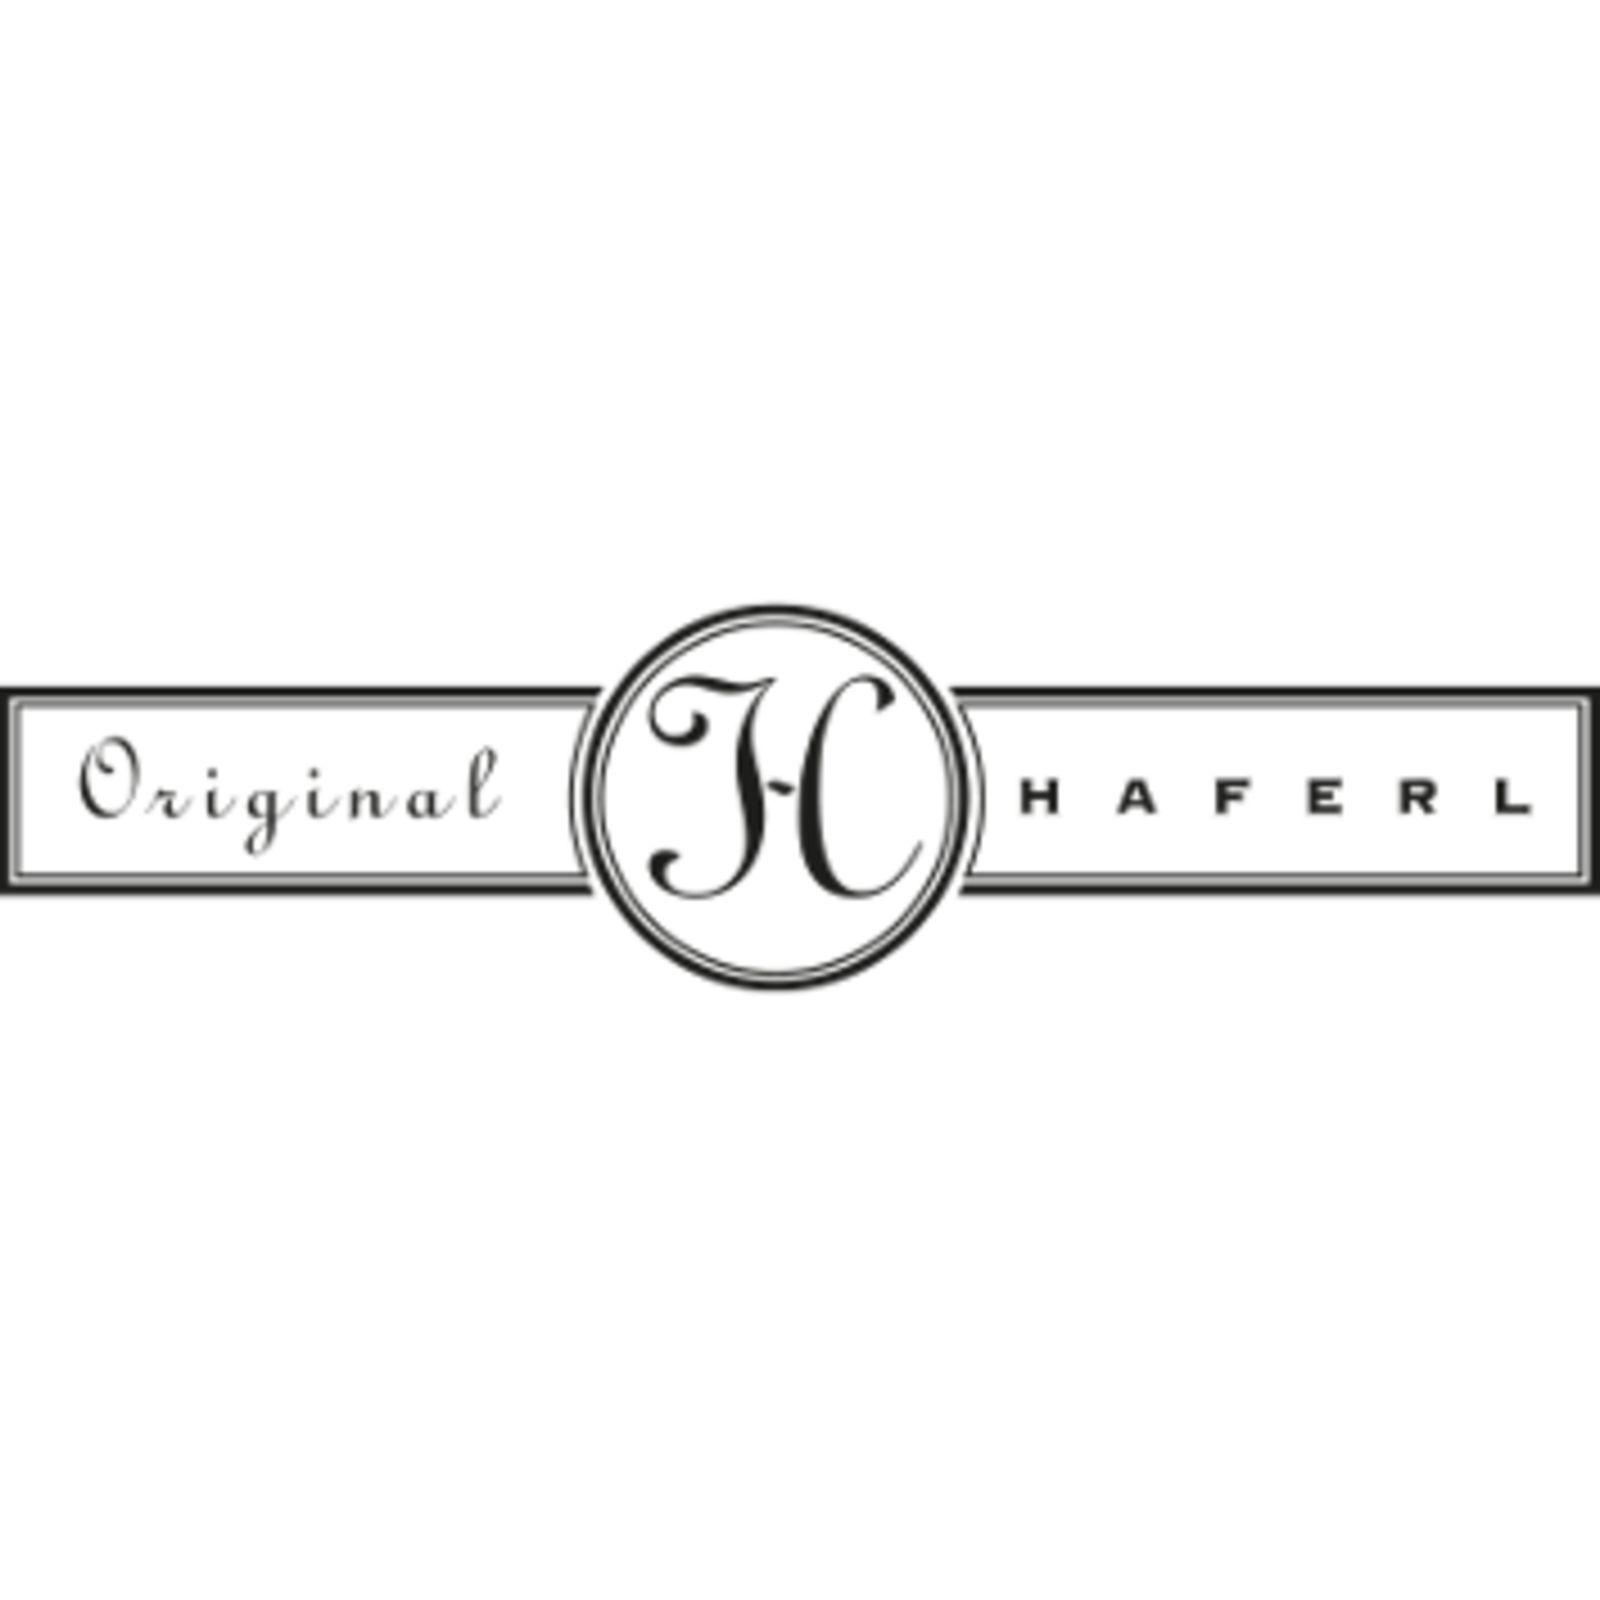 Original Haferl